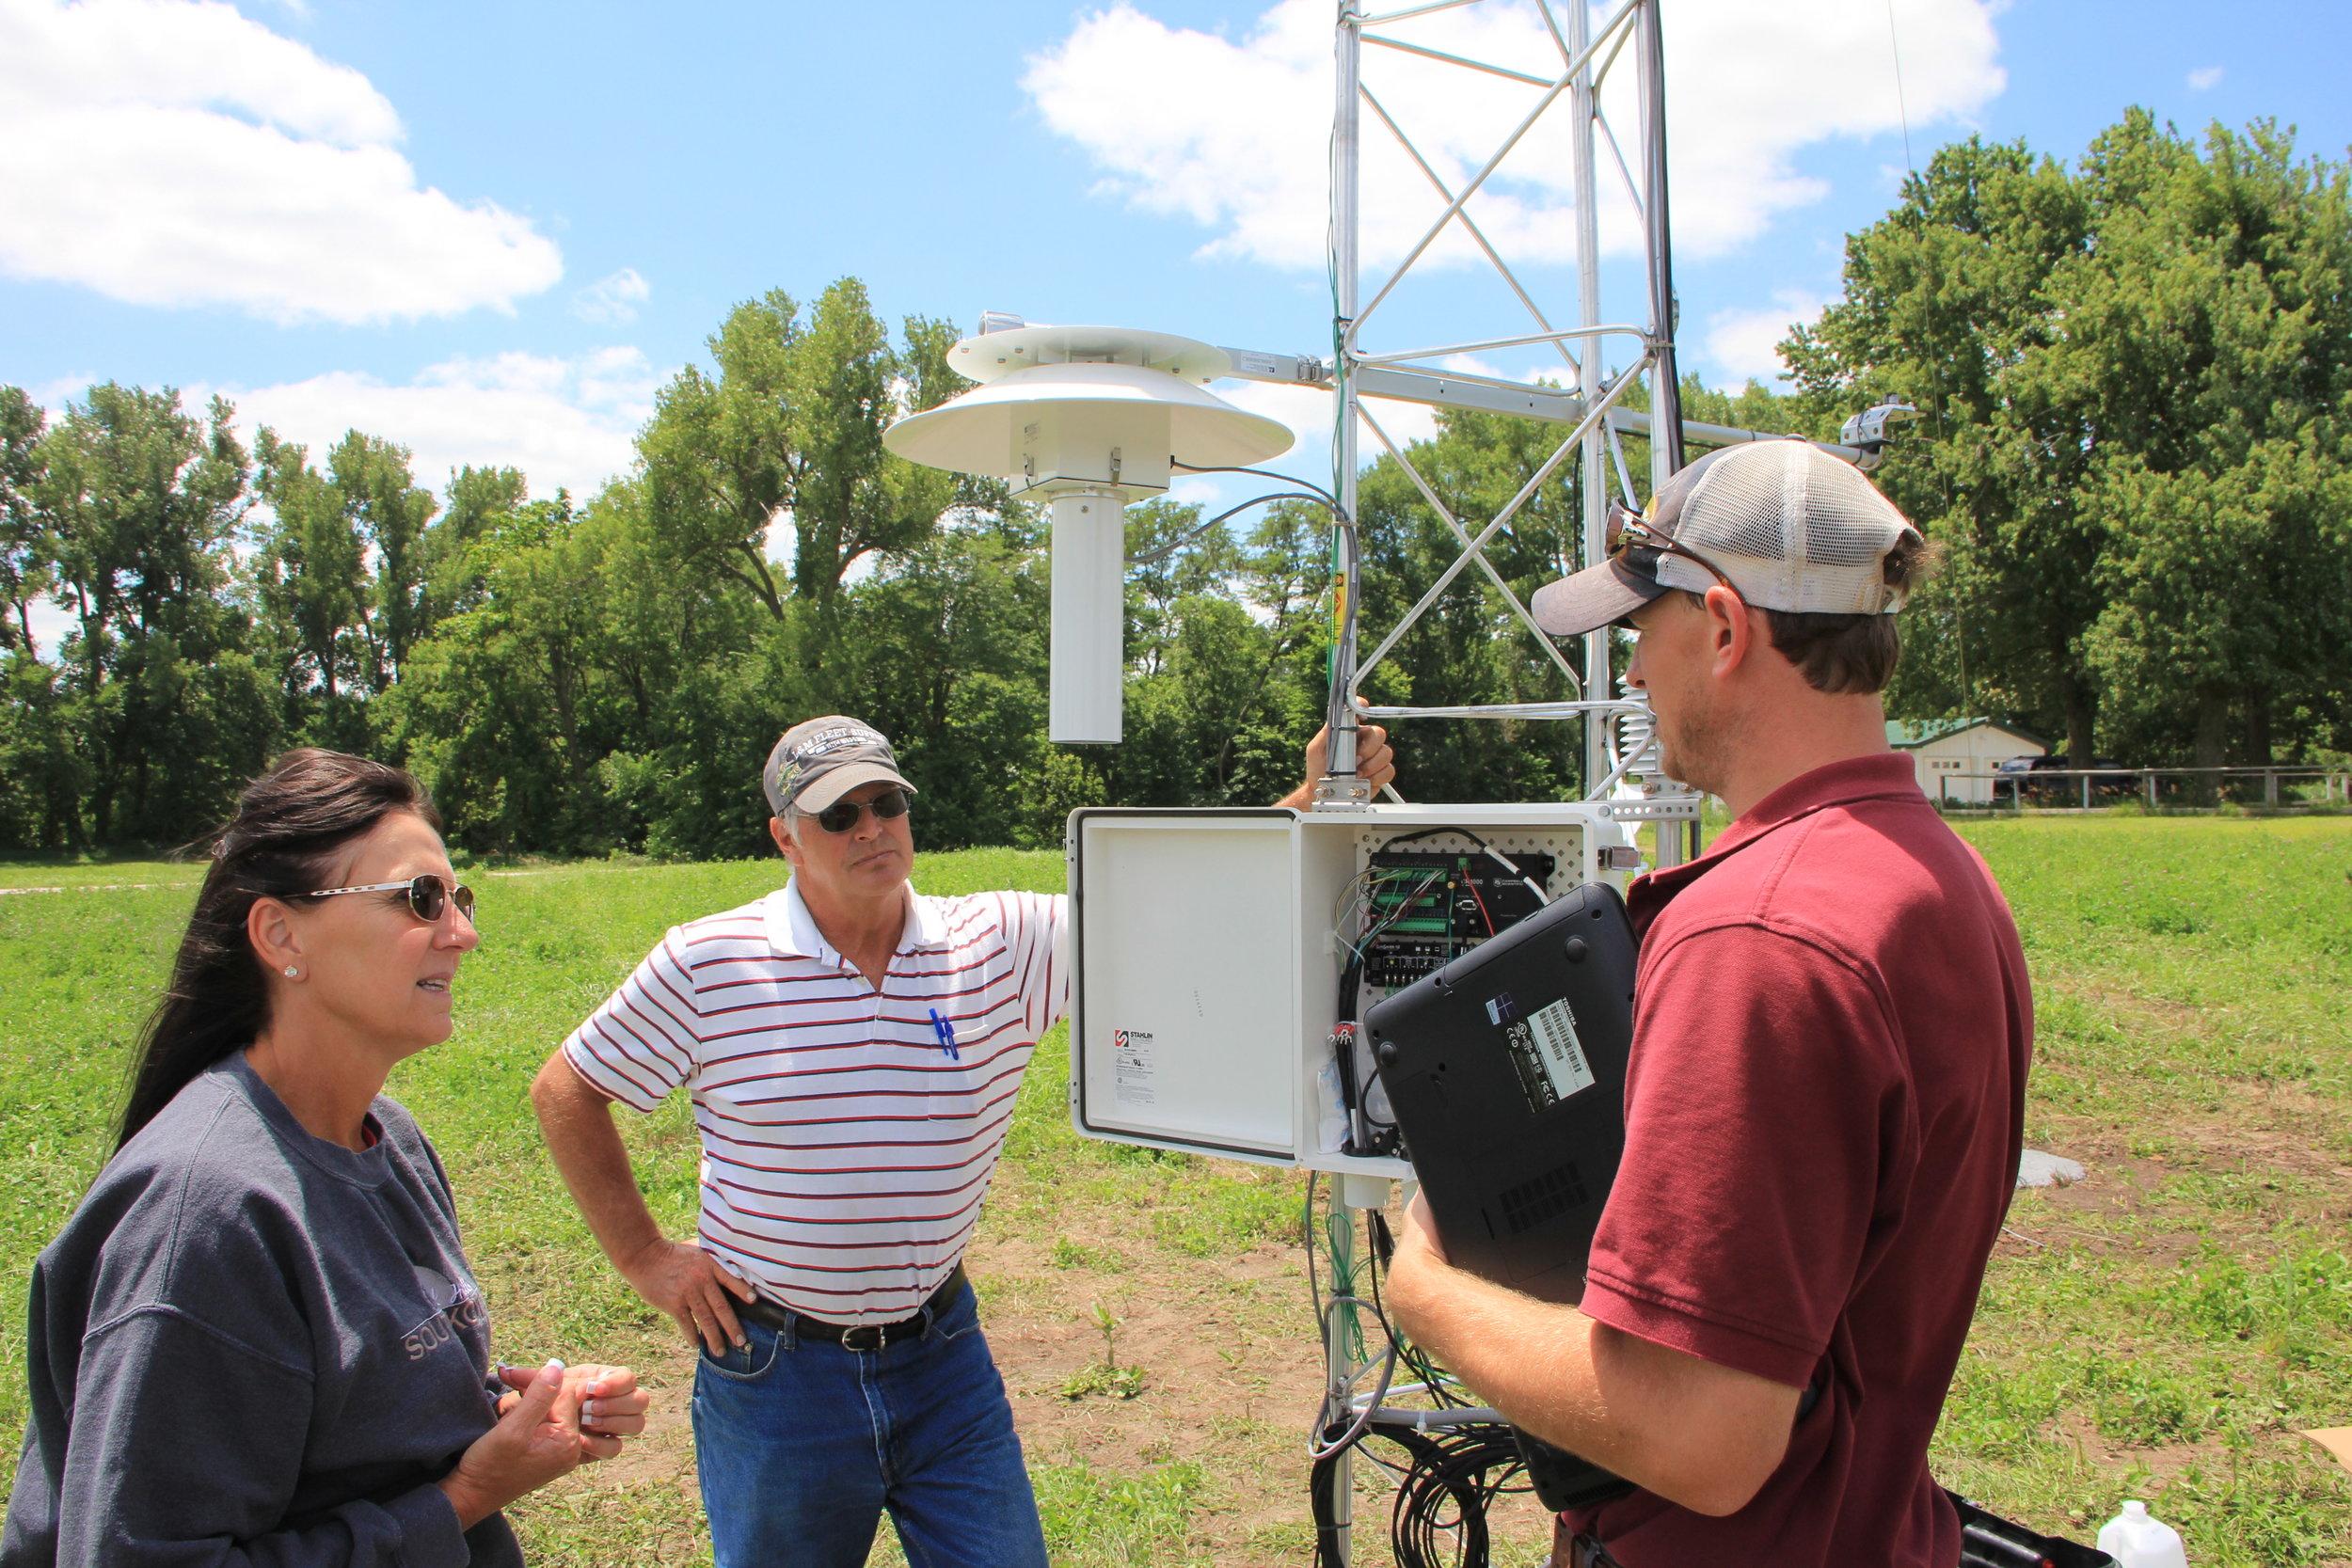 High tech, solar powered, met station installation and training,Southeast Nebraska, USA